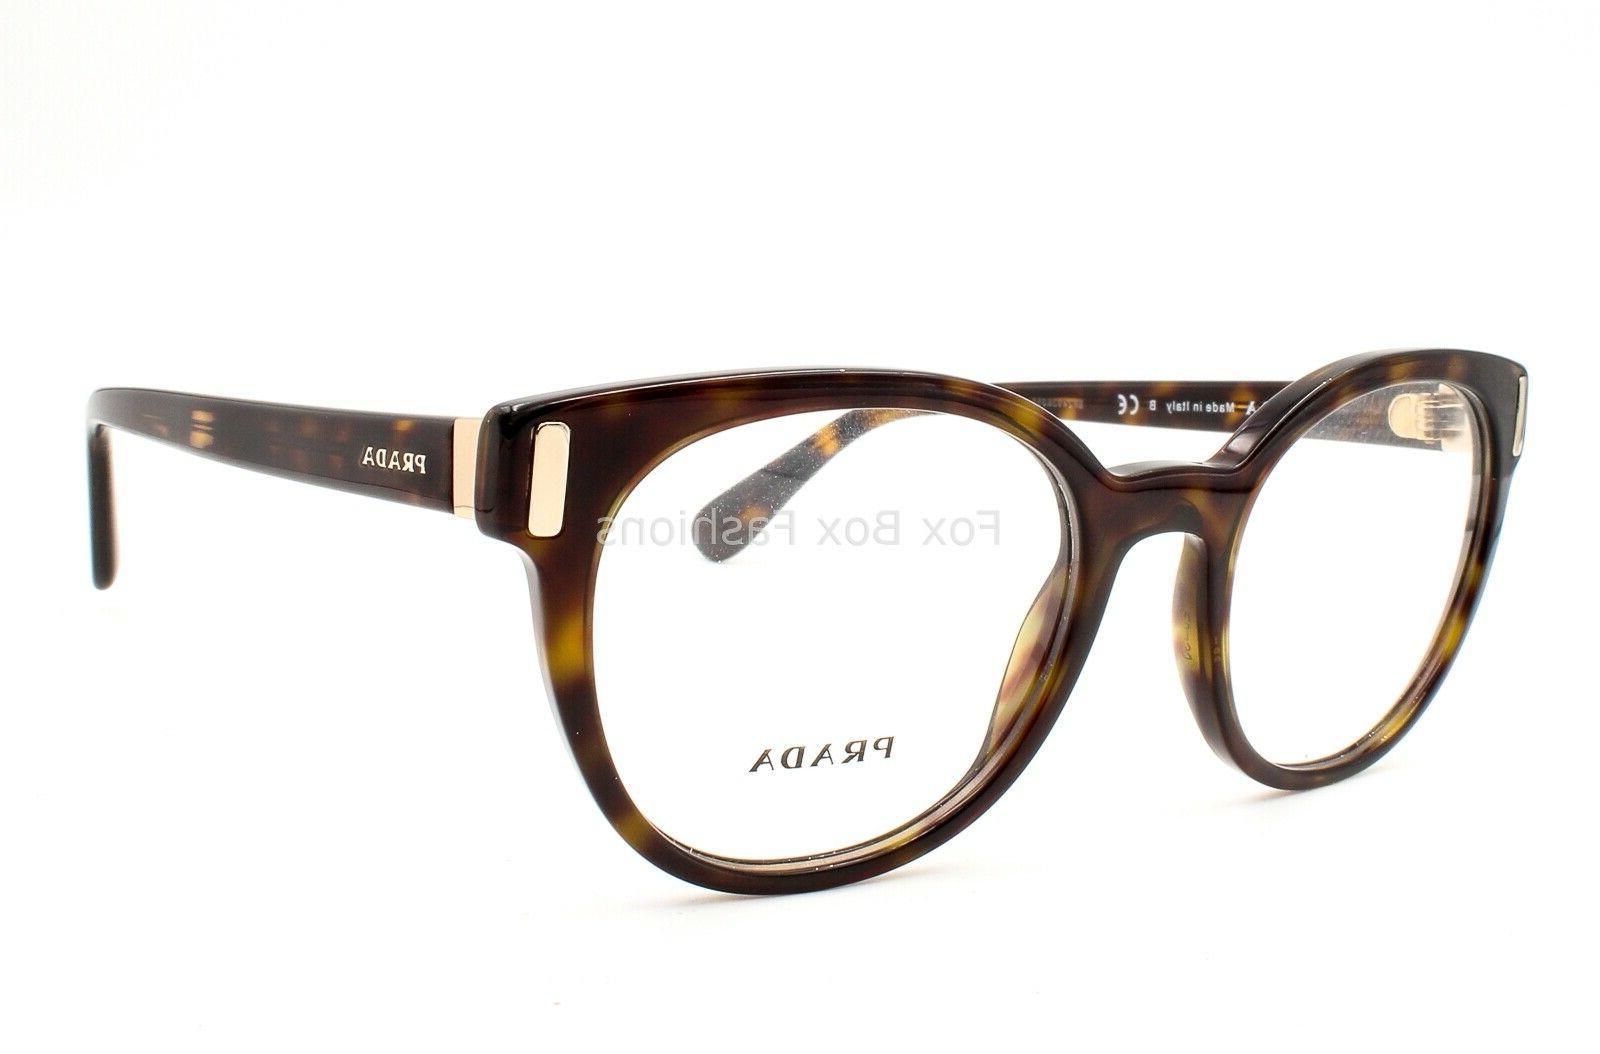 Prada Eyeglasses Frames Tortoise 50-20-135